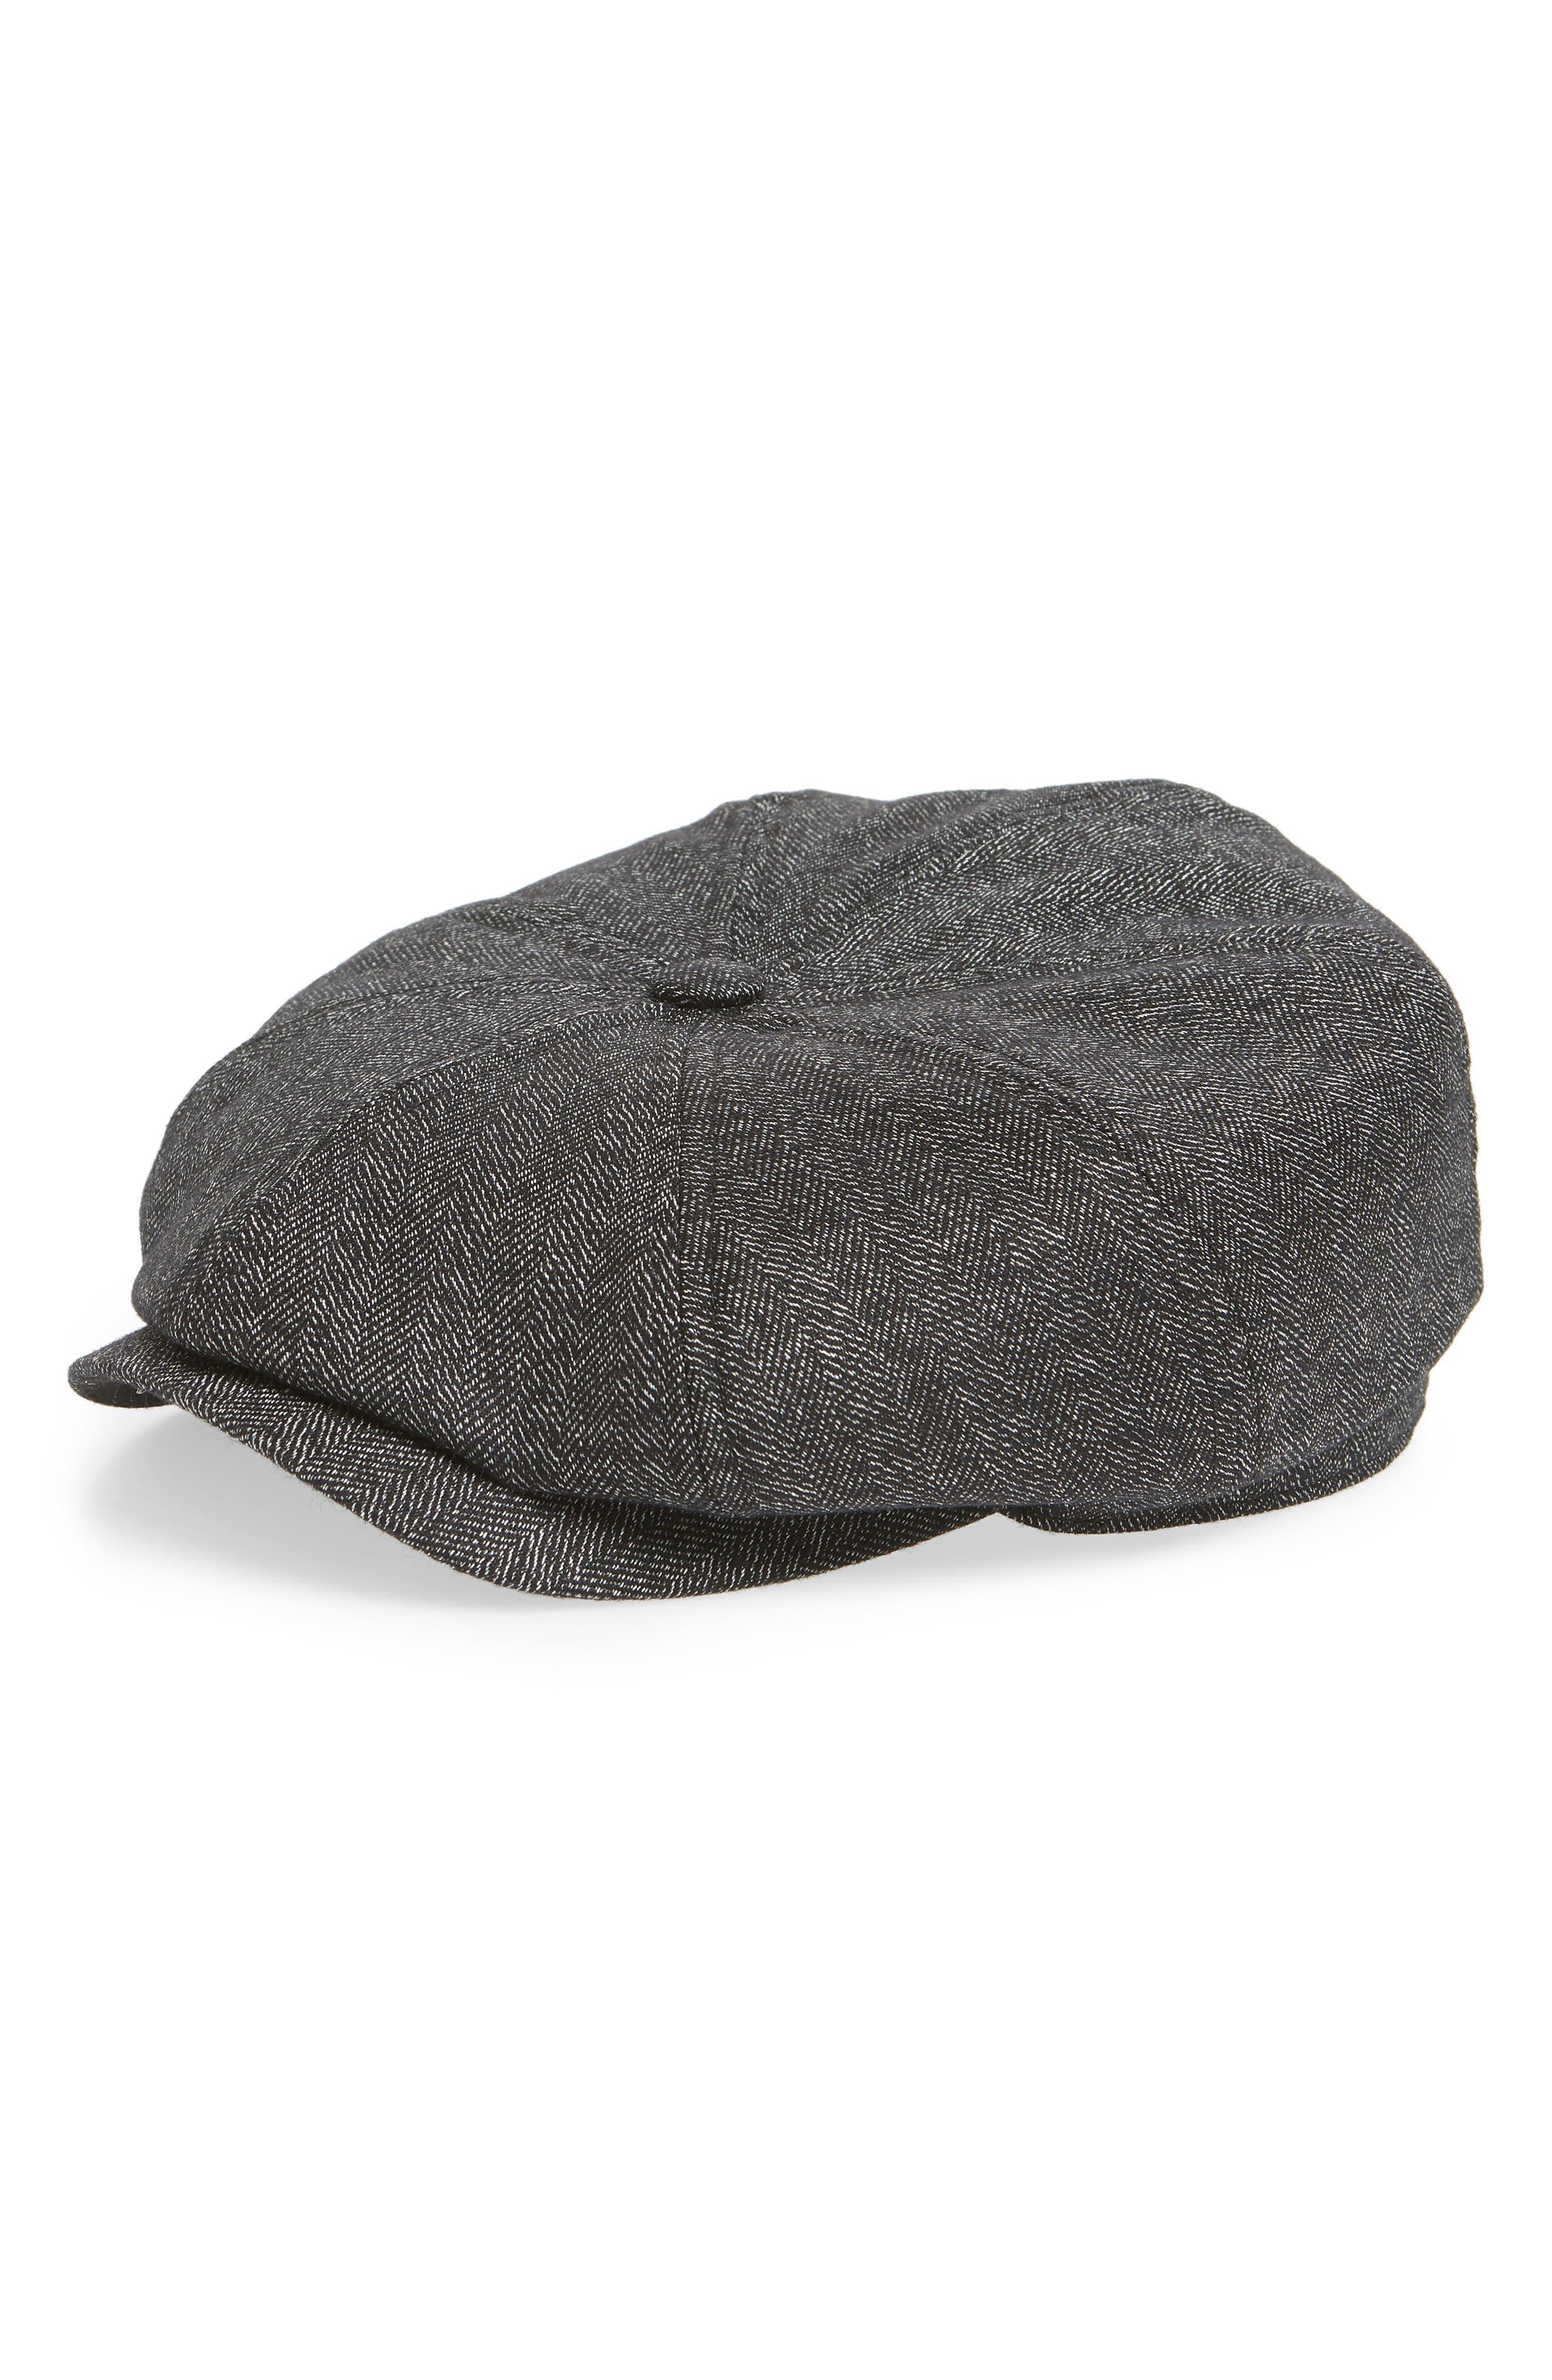 Herringbone Baker Boy Hat,                             Main thumbnail 1, color,                             020